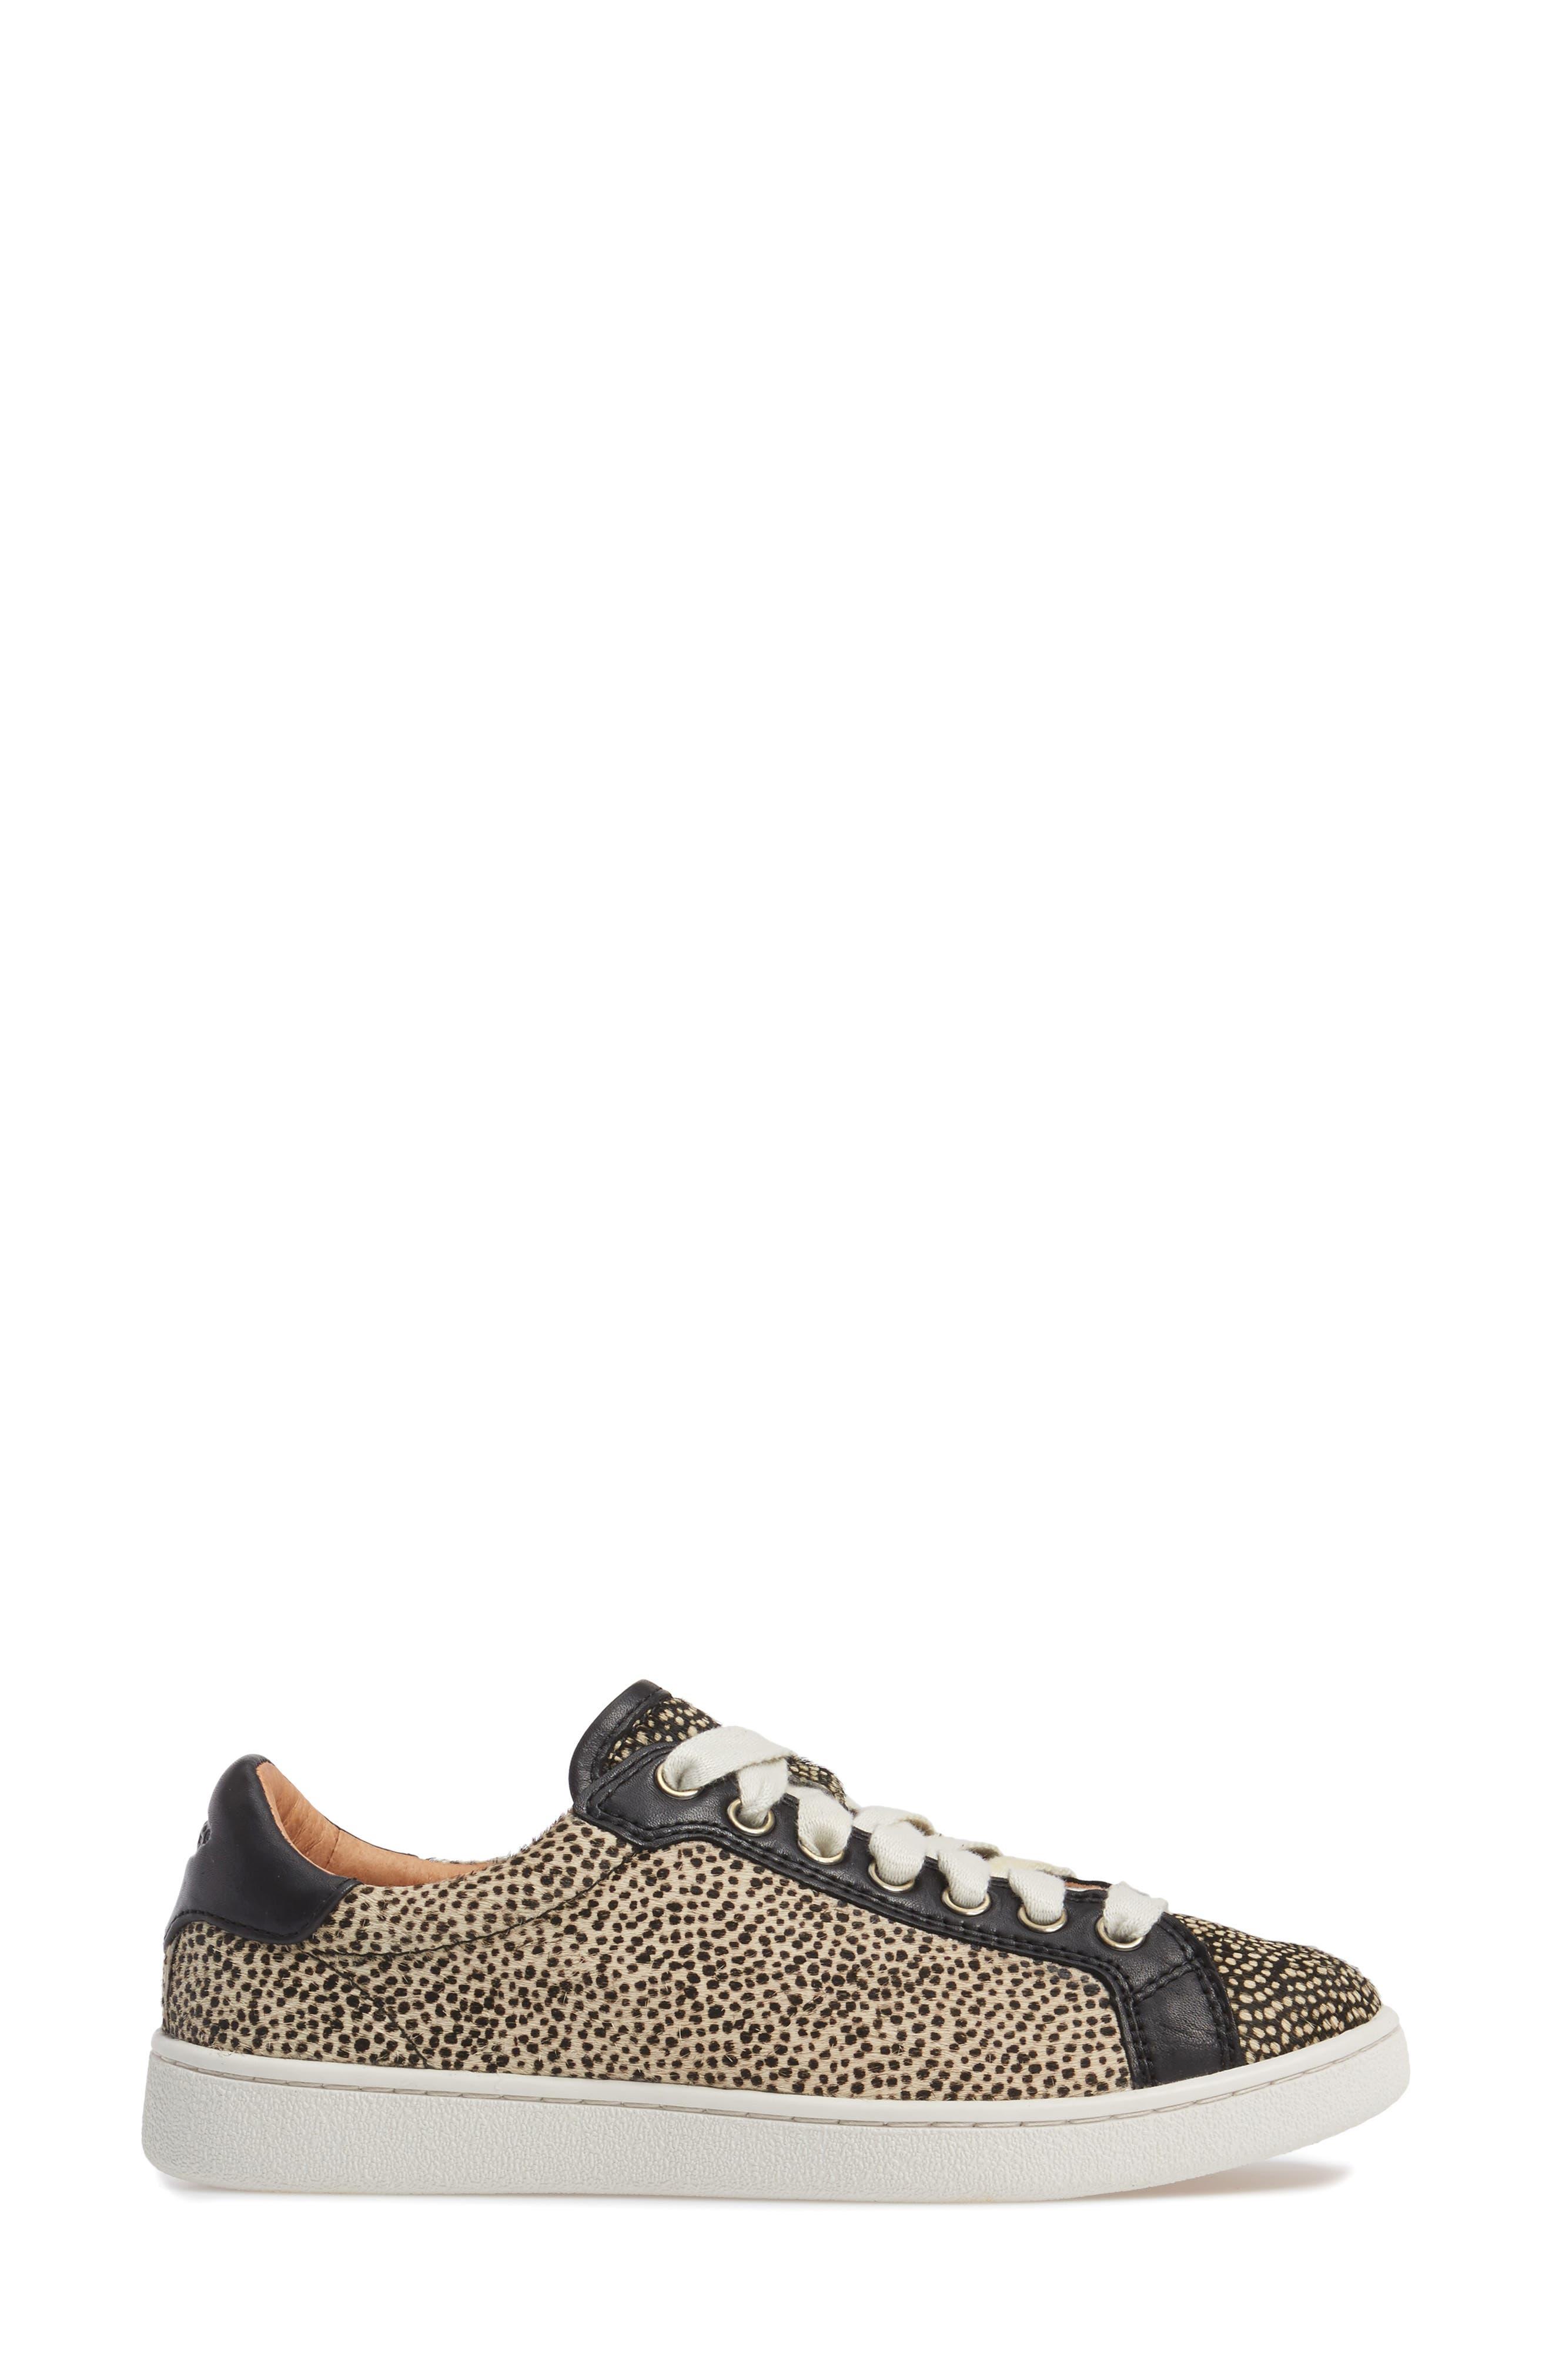 Alternate Image 3  - UGG® Milo Genuine Calf Hair Sneaker (Women)